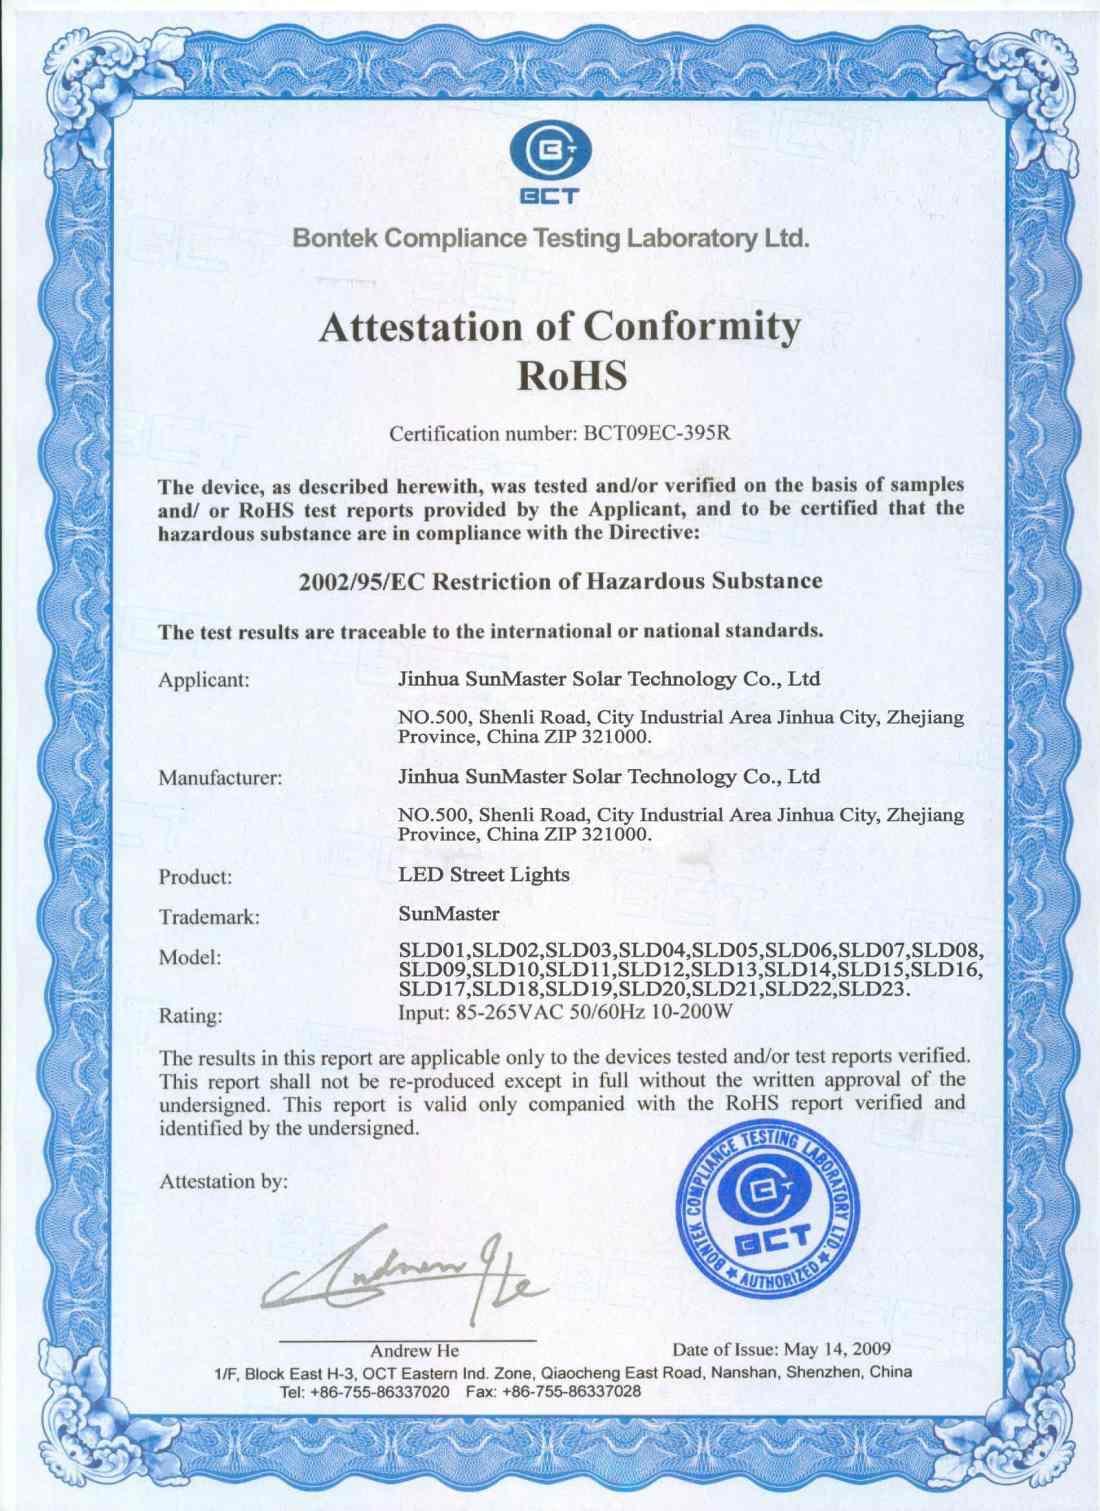 RoHS of LED Street Lights - Solar street lights certificates